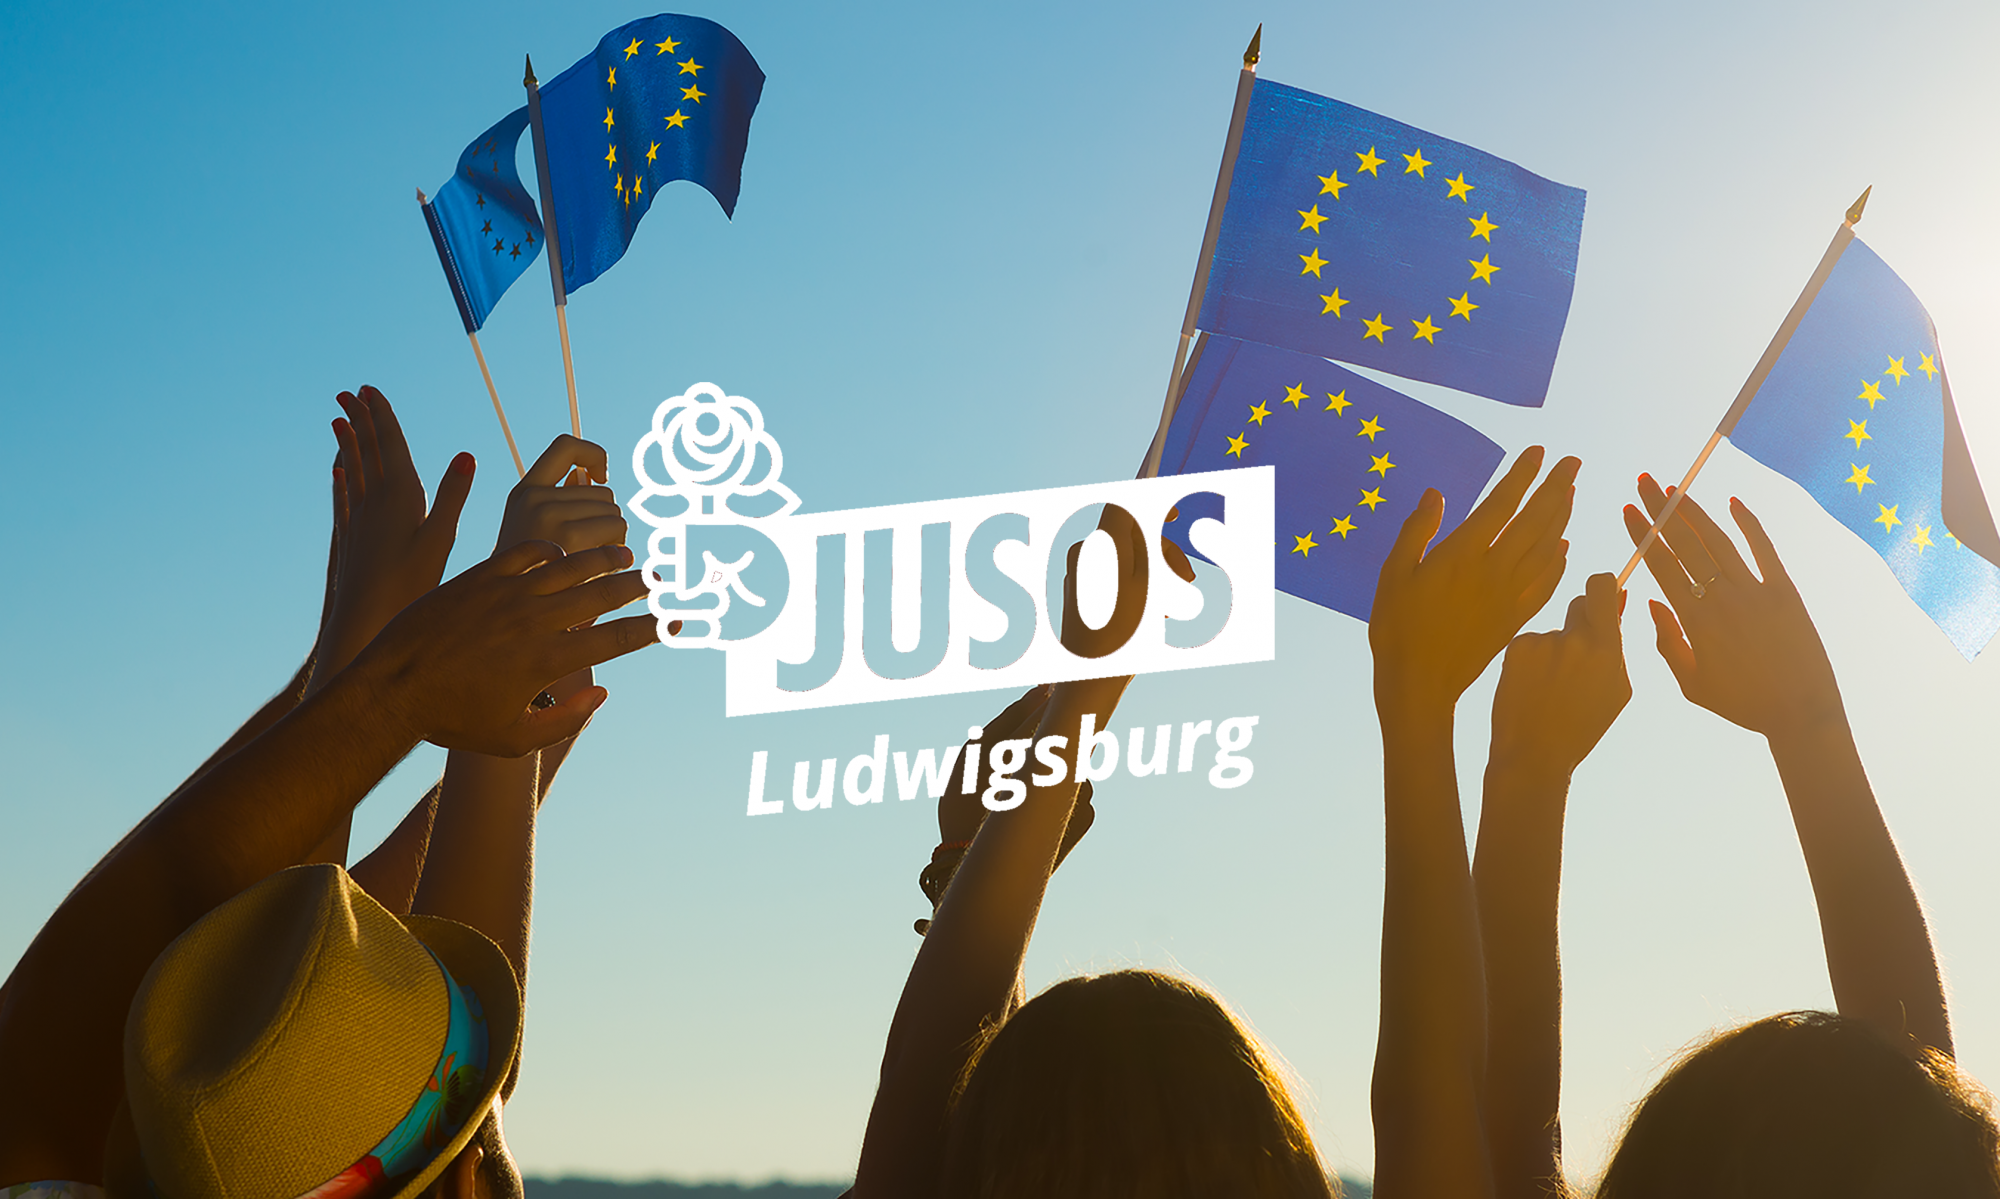 Jusos Ludwigsburg